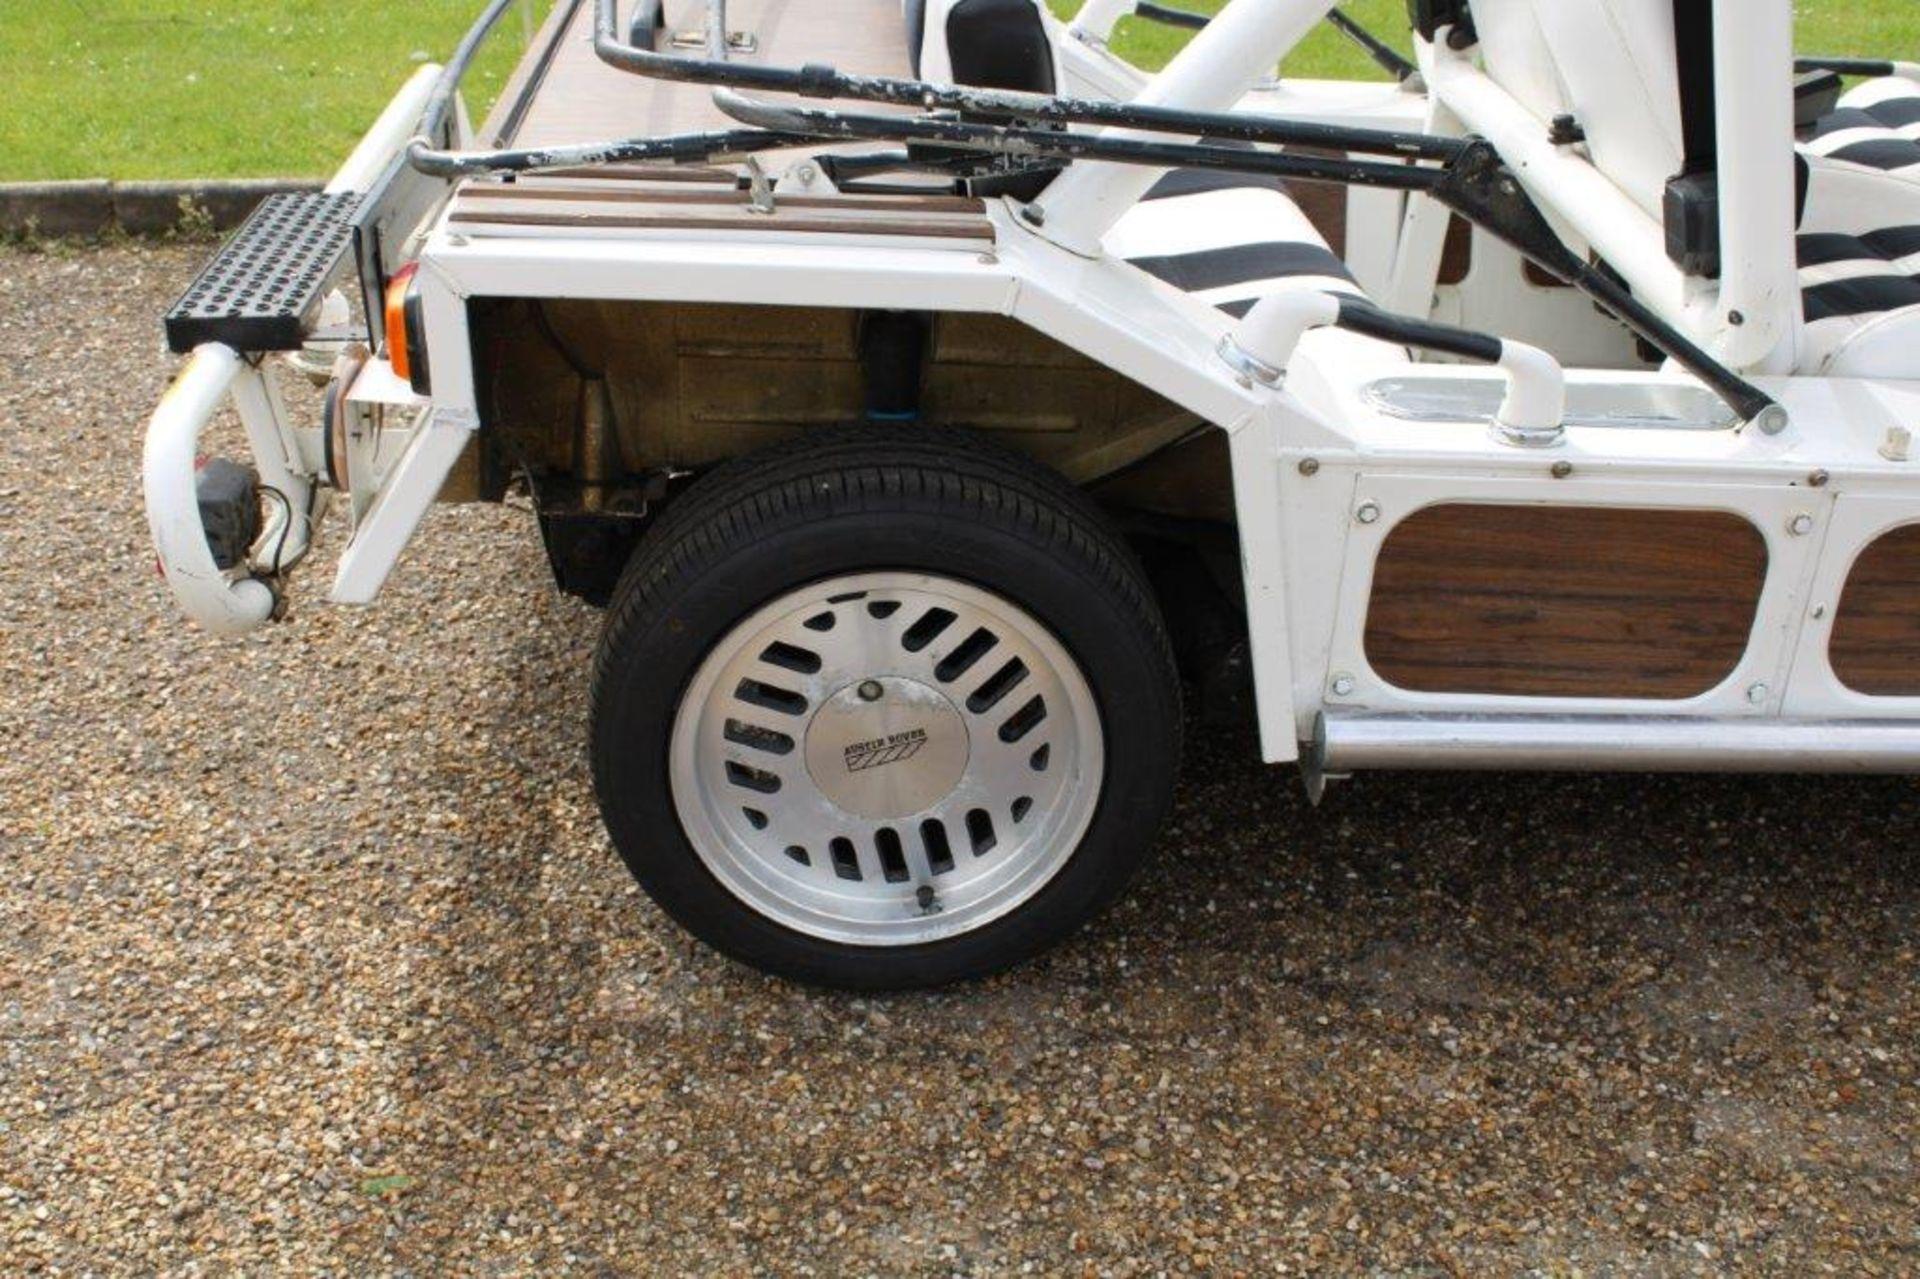 1988 Austin Rover Mini Moke - Image 8 of 22